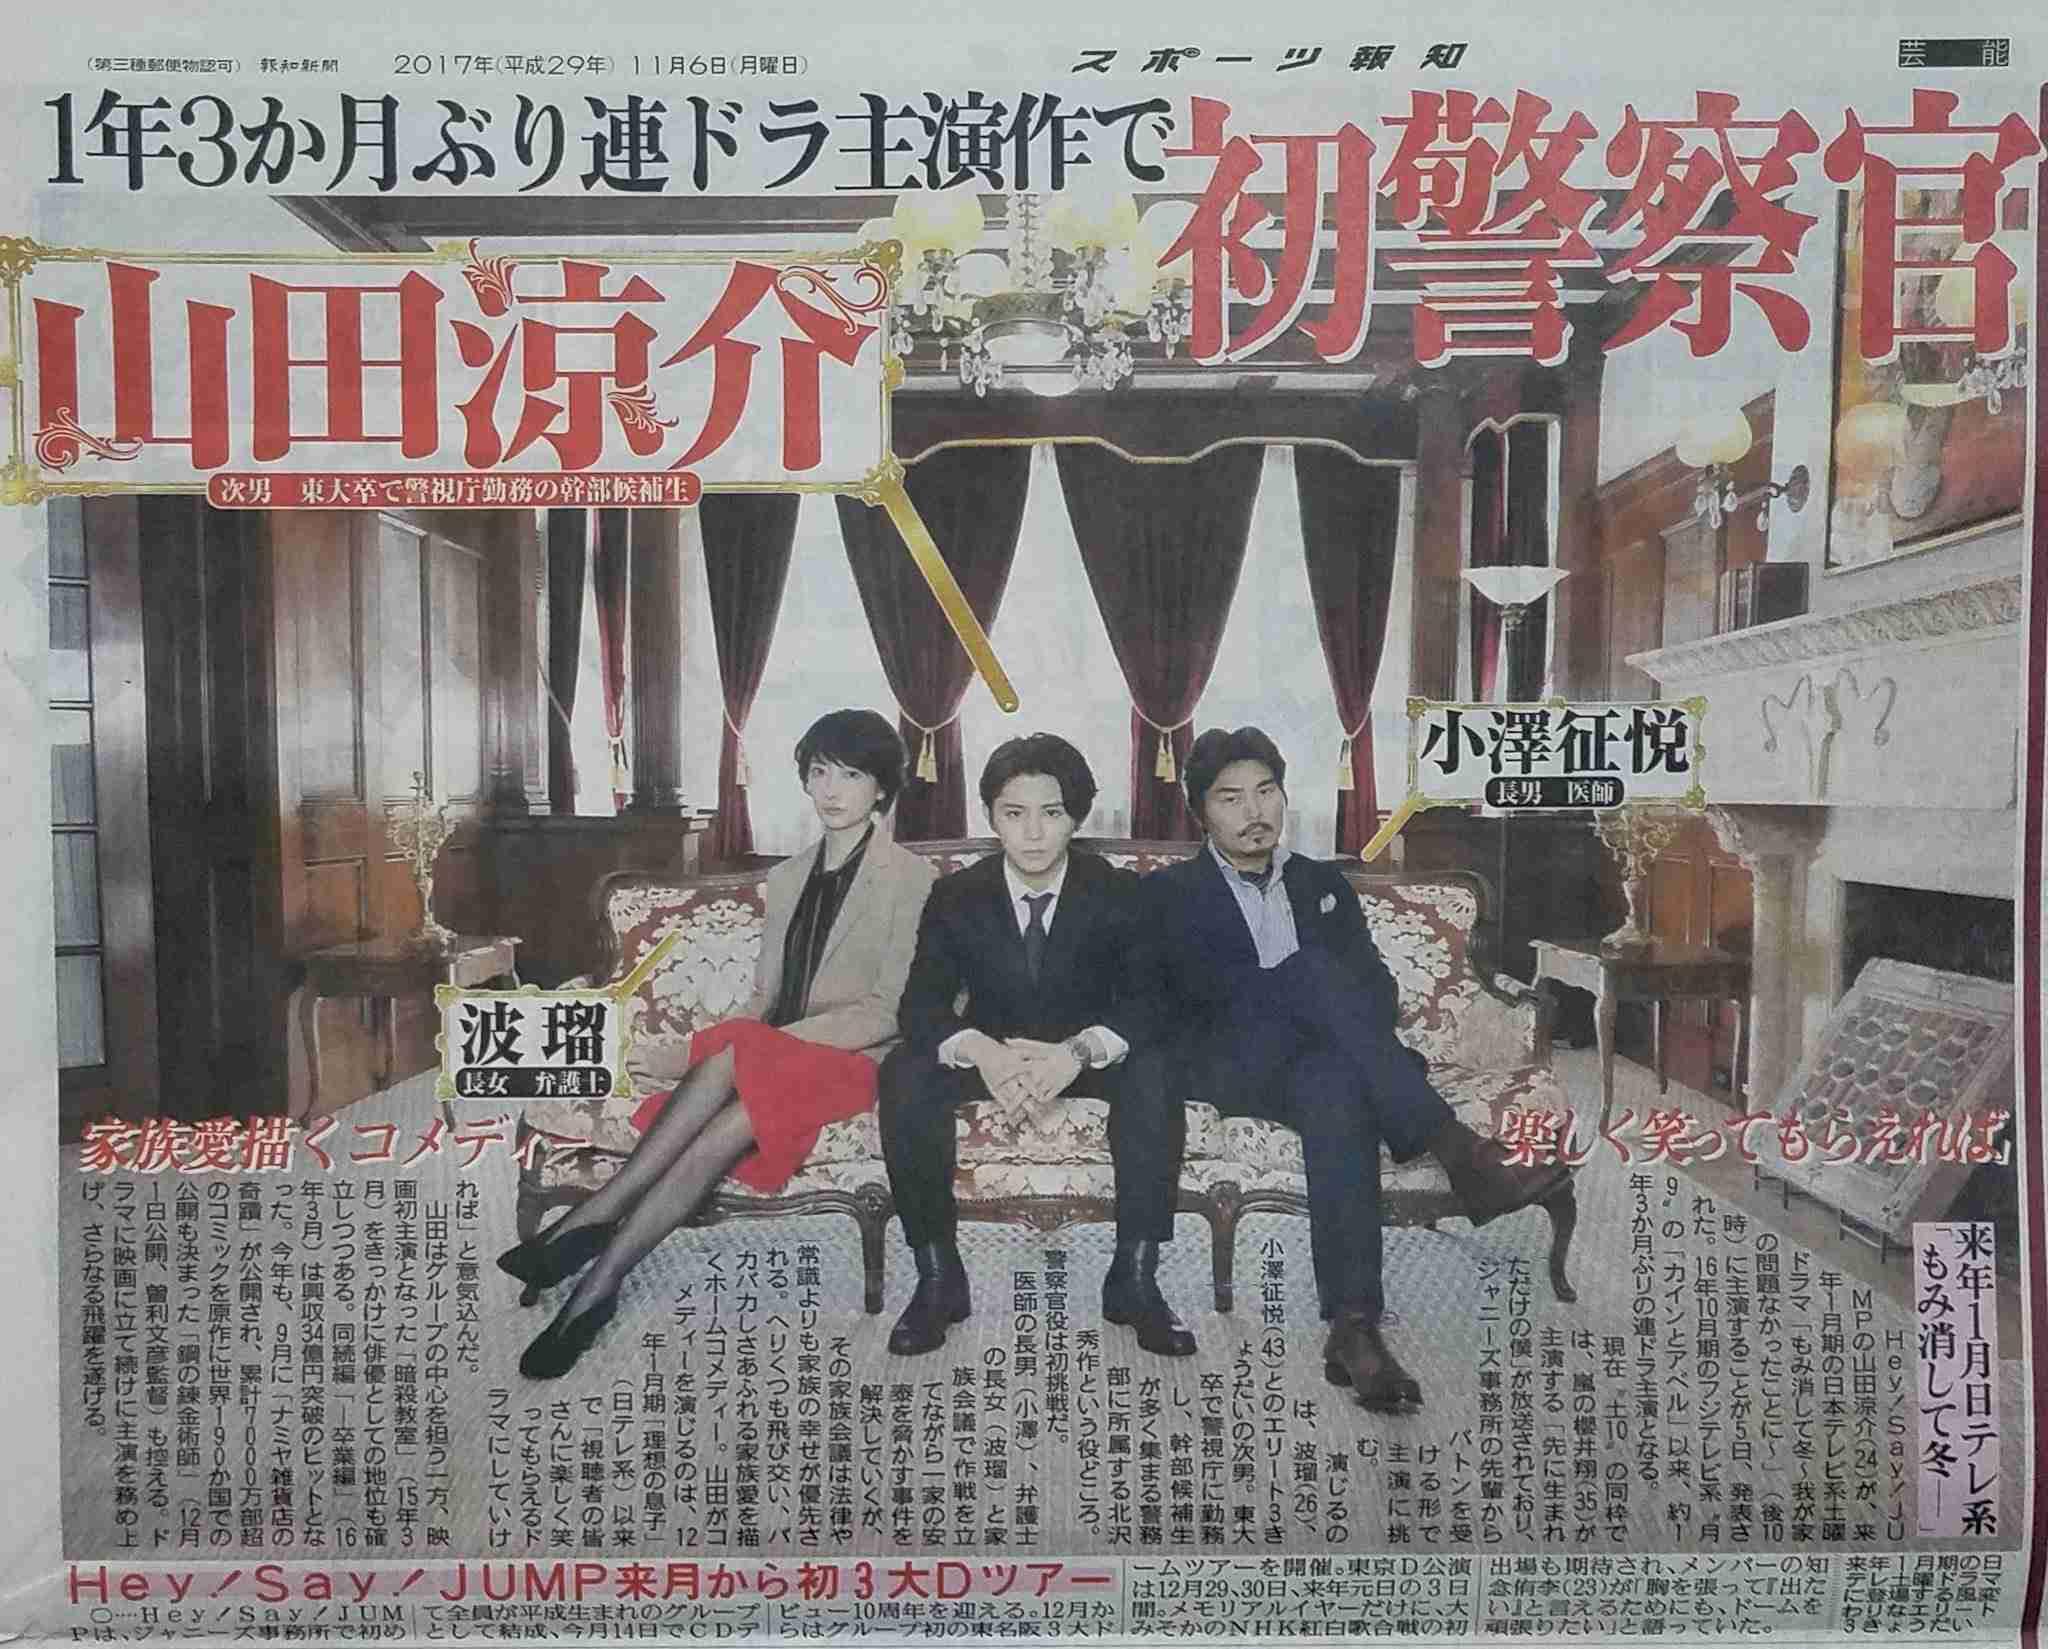 Hey!Say!JUMP・山田涼介、1月期「日テレ土曜ドラマ」主演内定!ヒロインは波瑠